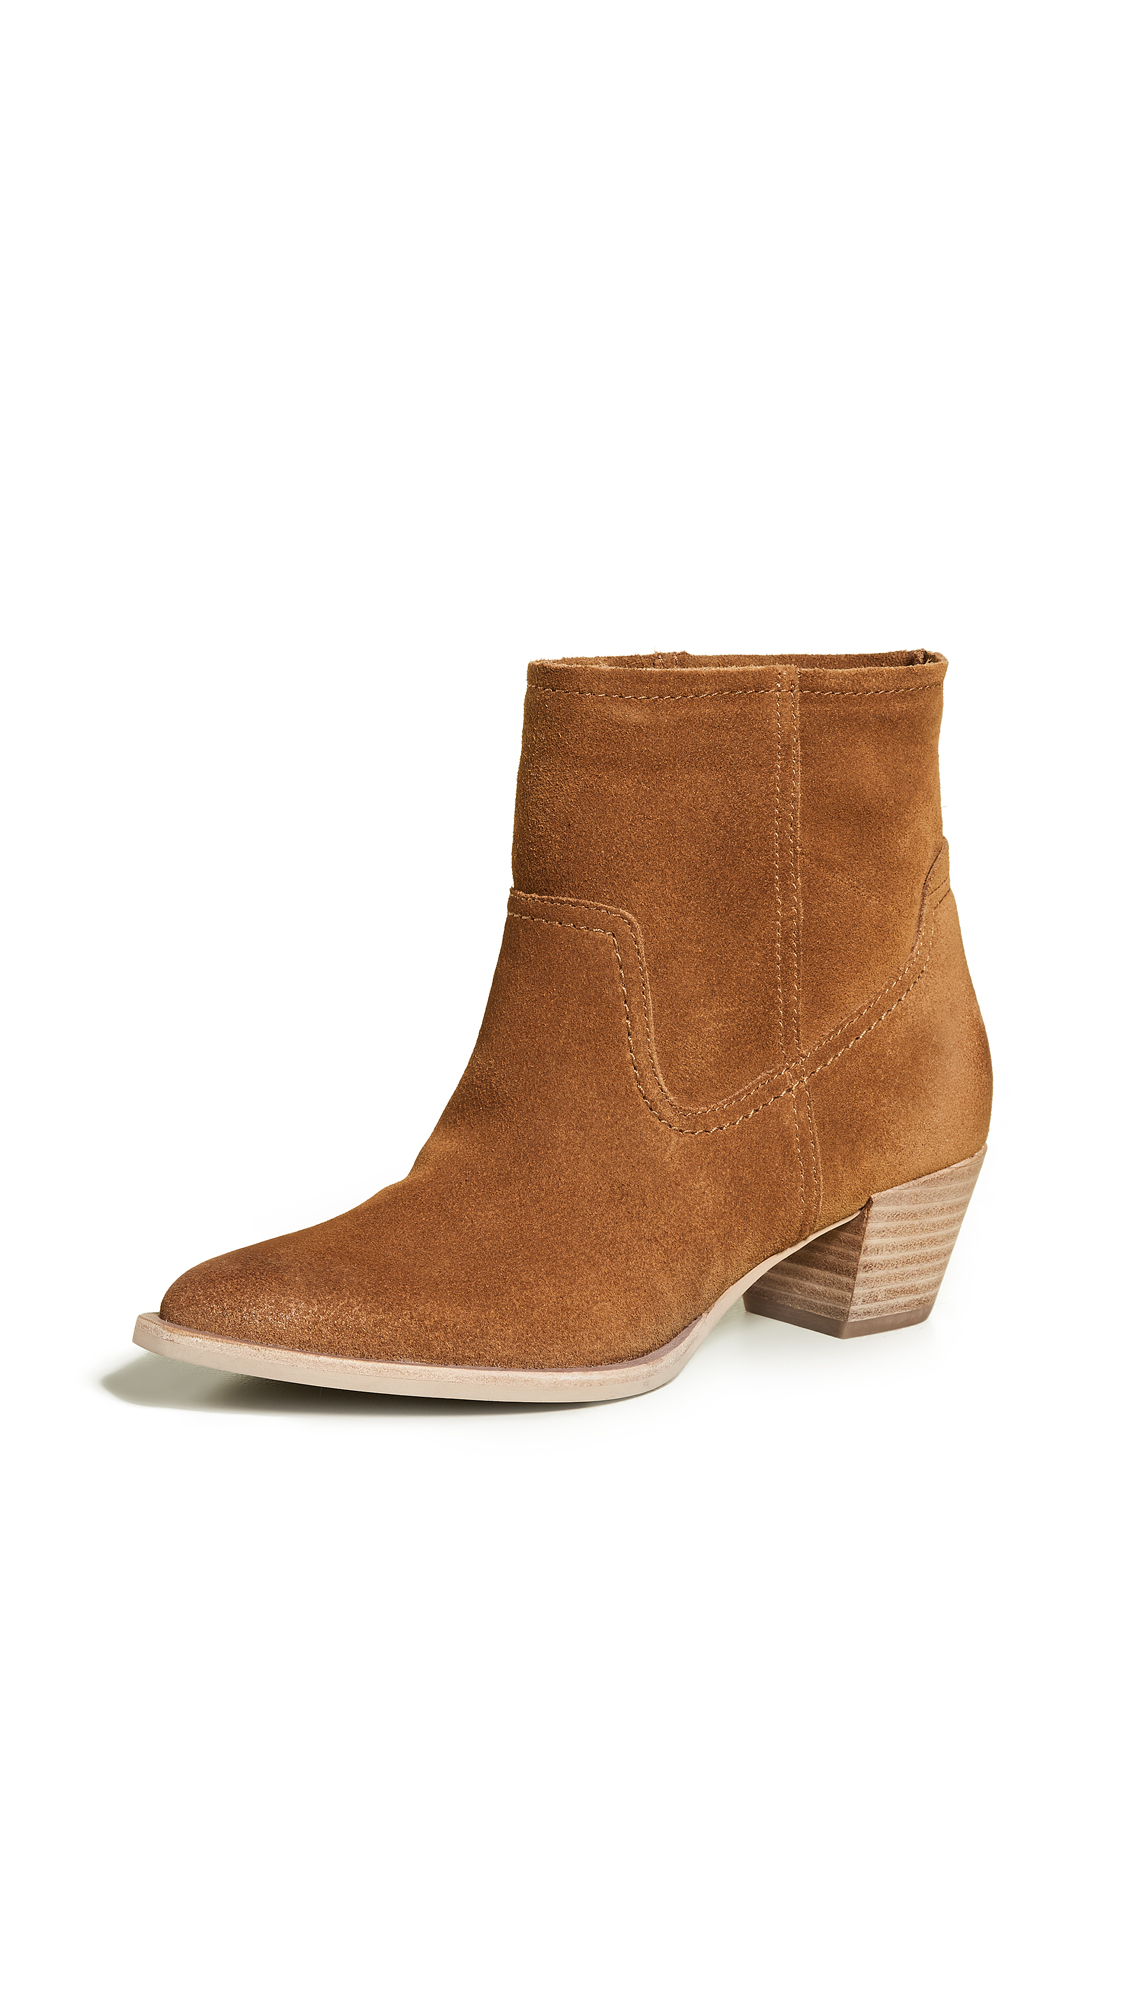 Dolce Vita Kodi Point Toe Boots - Saddle